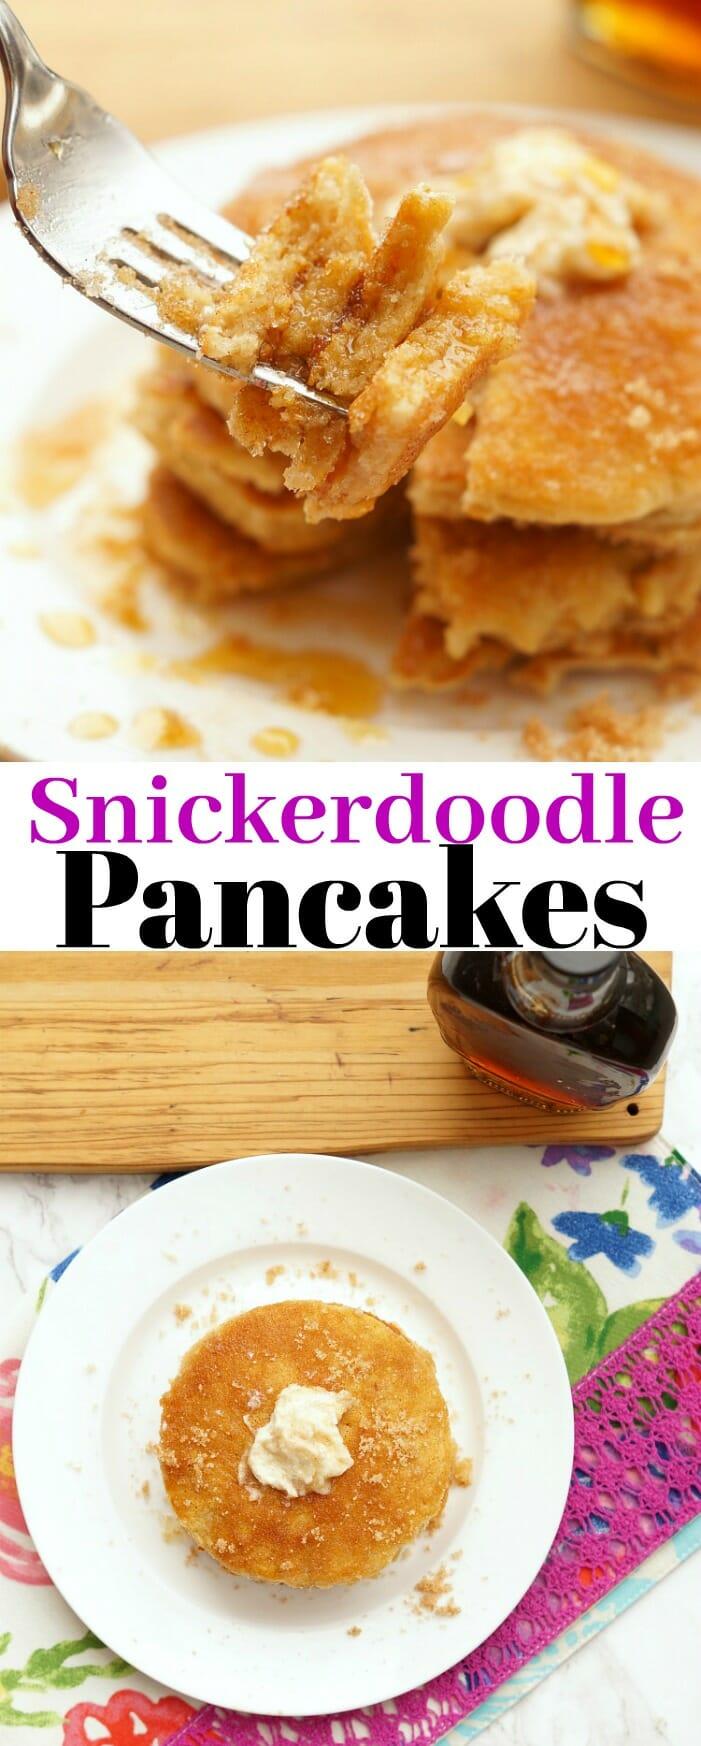 Easy Snickerdoodle Pancakes